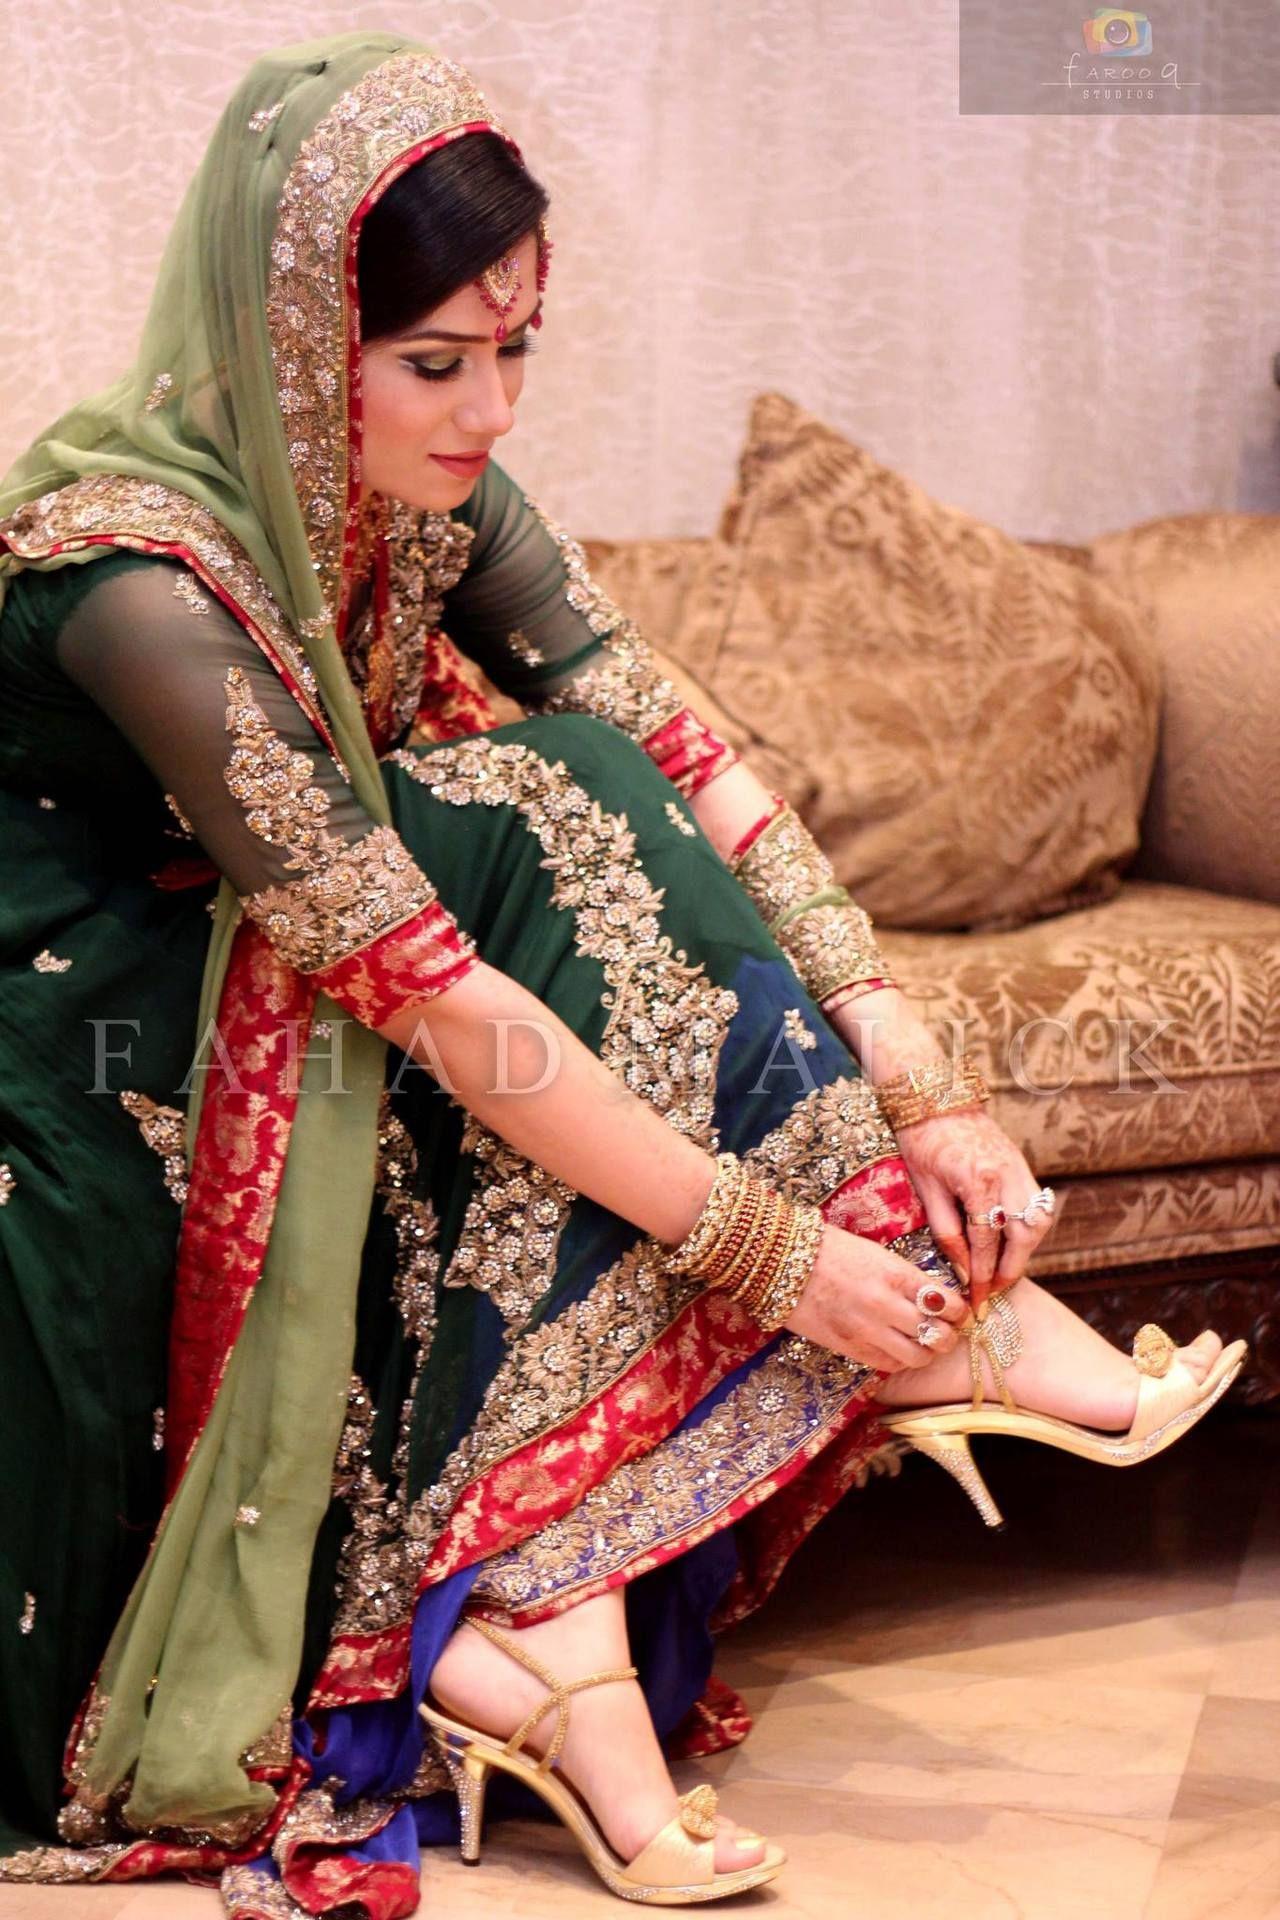 1eadd9d975 Pakistani Bride Light and dark green combination | Wedding ...